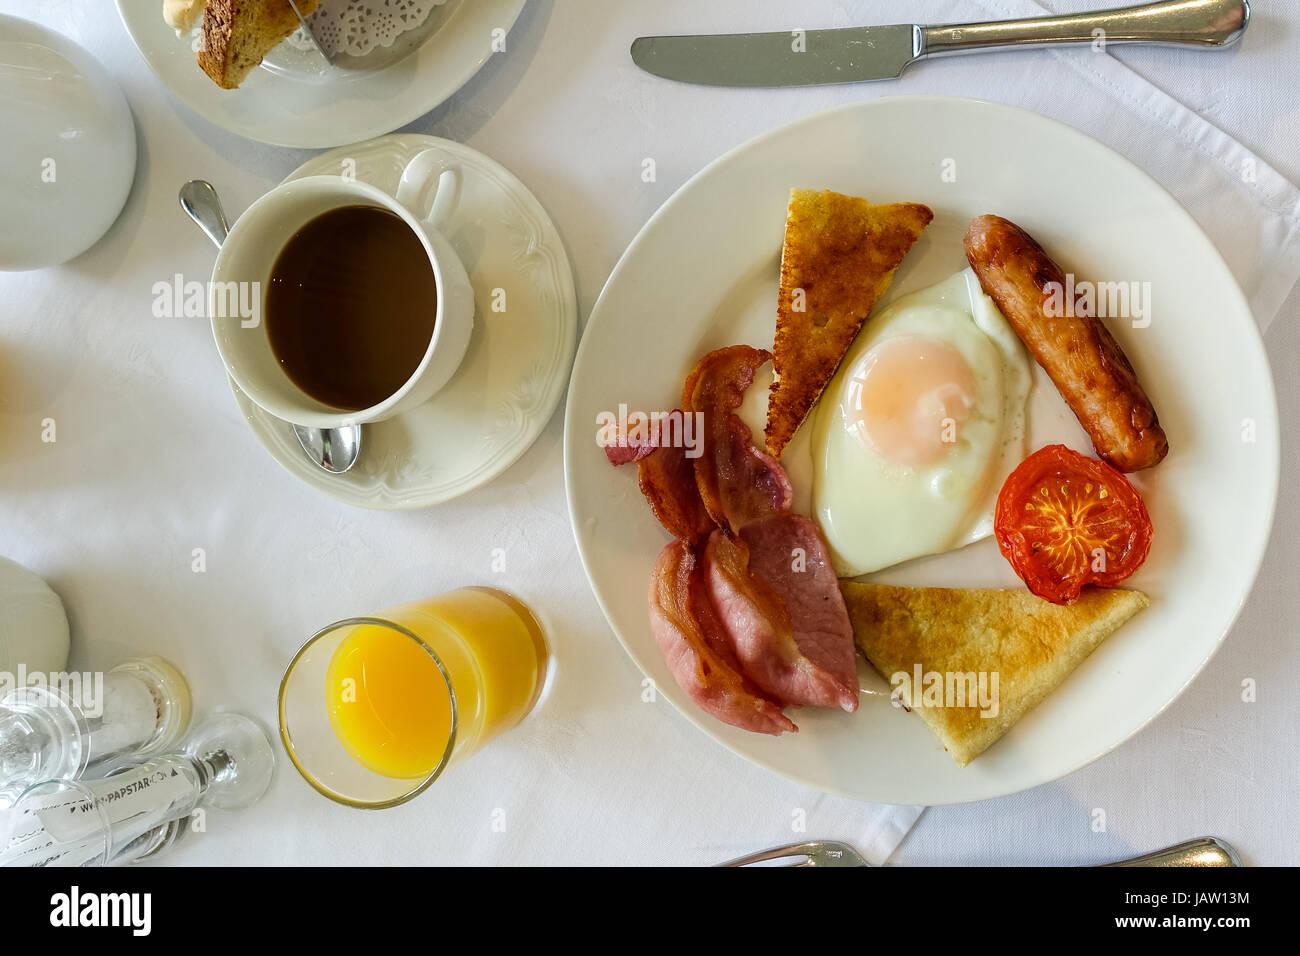 Ulster fry, full breakfast including fried egg, bacon rashers, tomato, sausage, soda bread and potato bread. Orange - Stock Image